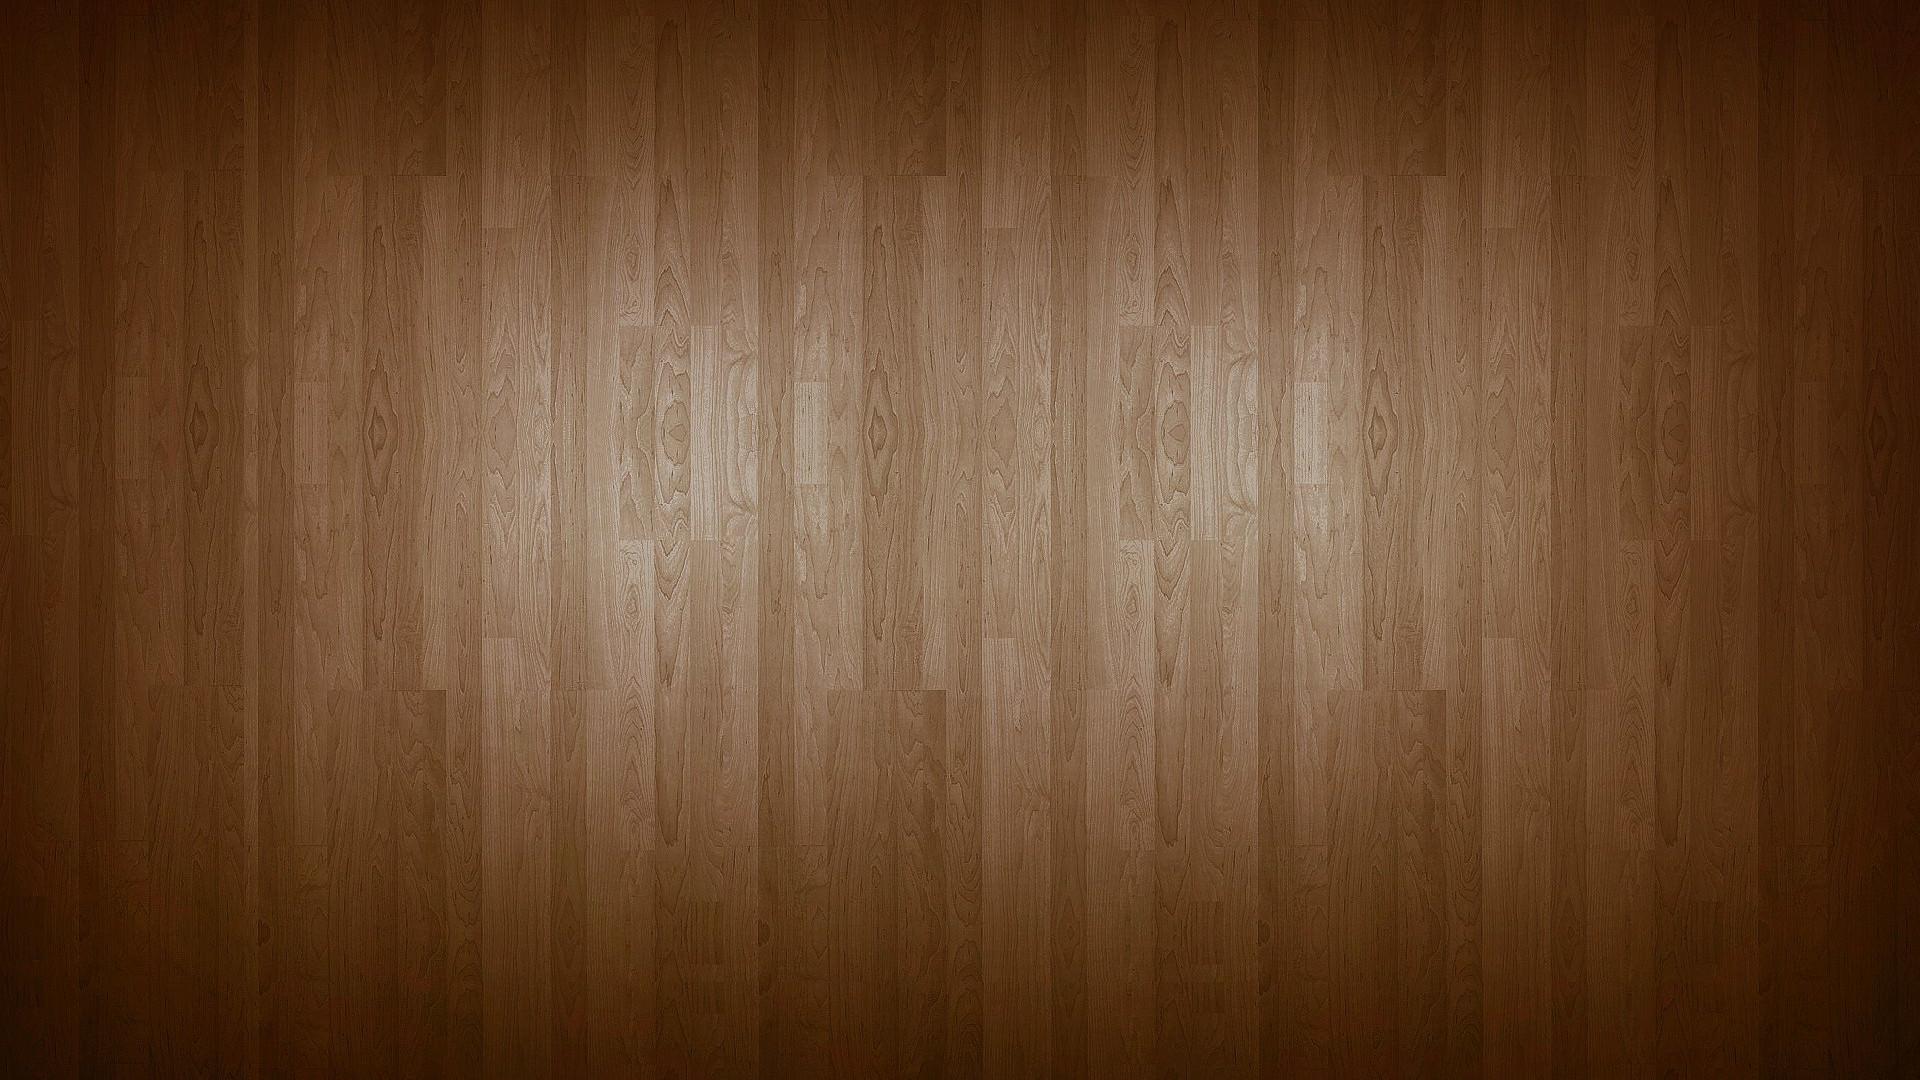 … Charming Ideas Wood Floors Background 3 Brown Wood Floor HD Wallpaper  Background …